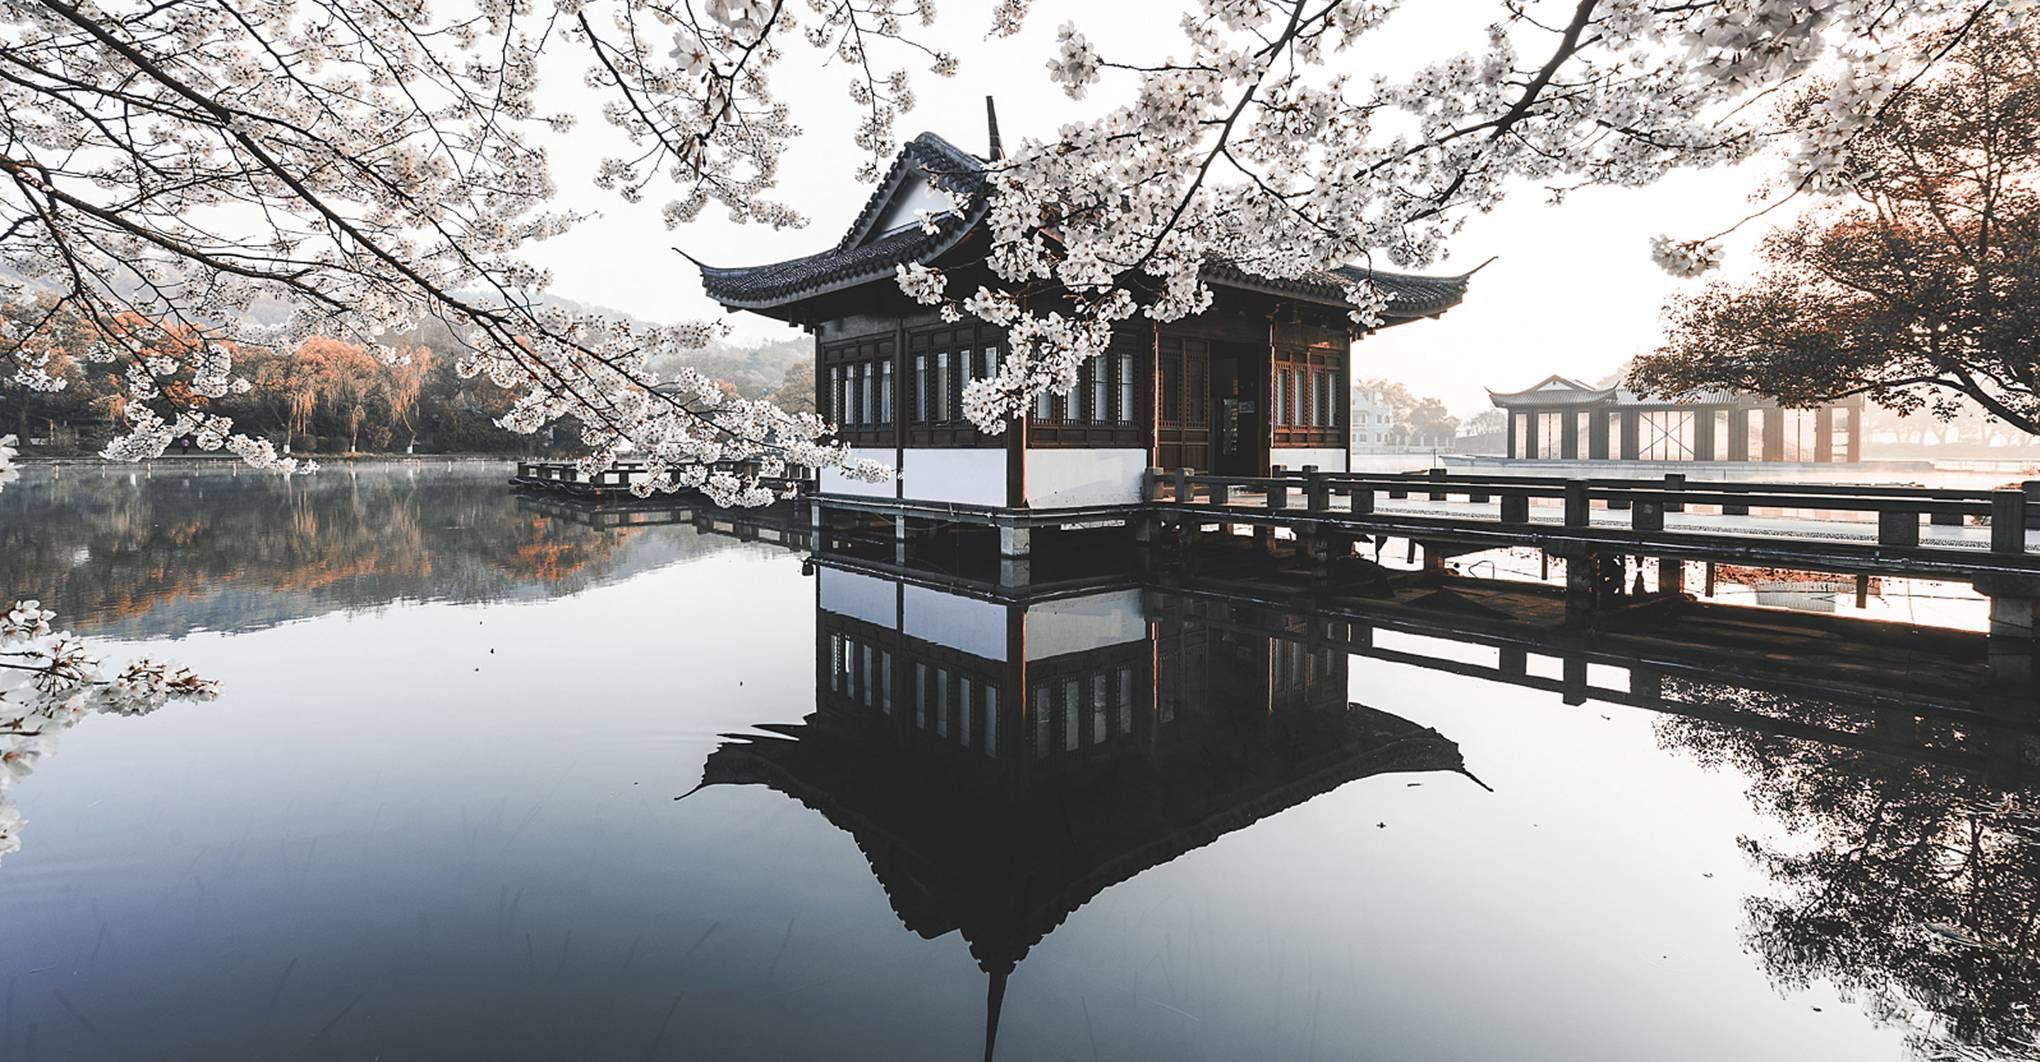 10 ways to experience Hangzhou